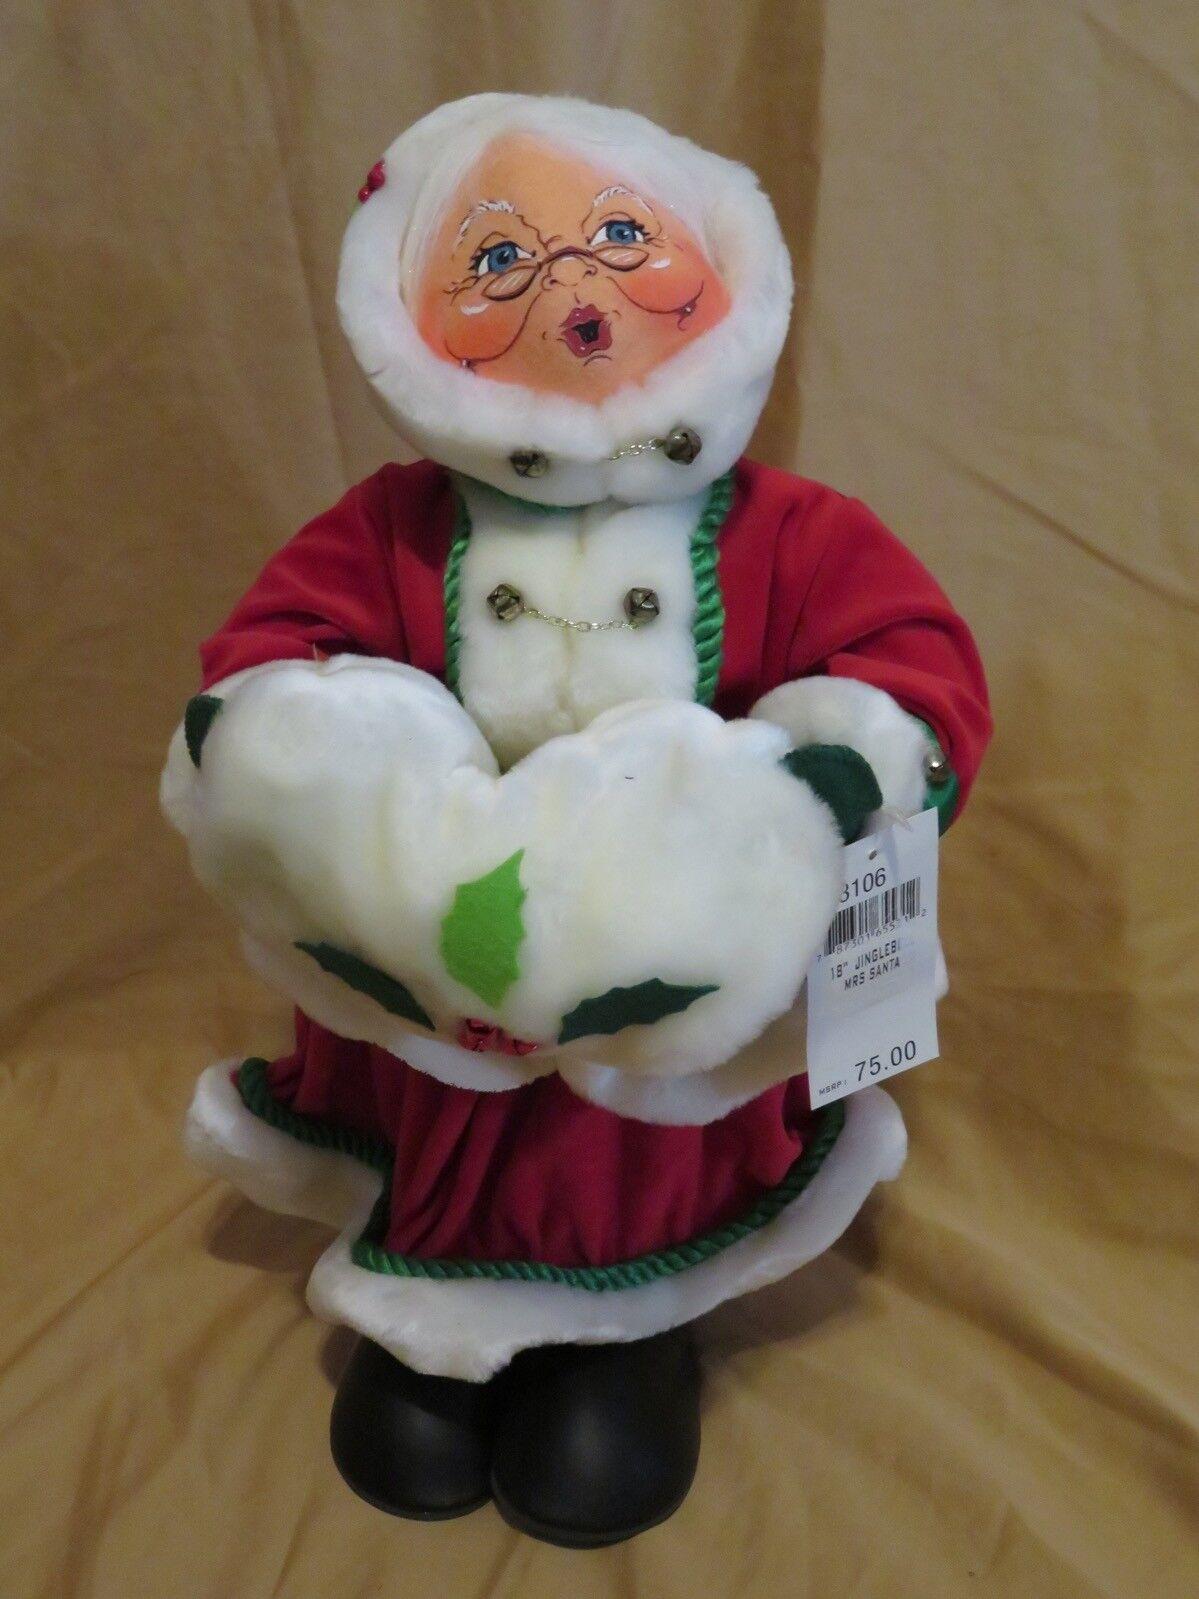 Nueva Christmas Annalee Muñeca 45.7cm Mrs Mrs Mrs Jinglebell Santa Claus de Pie